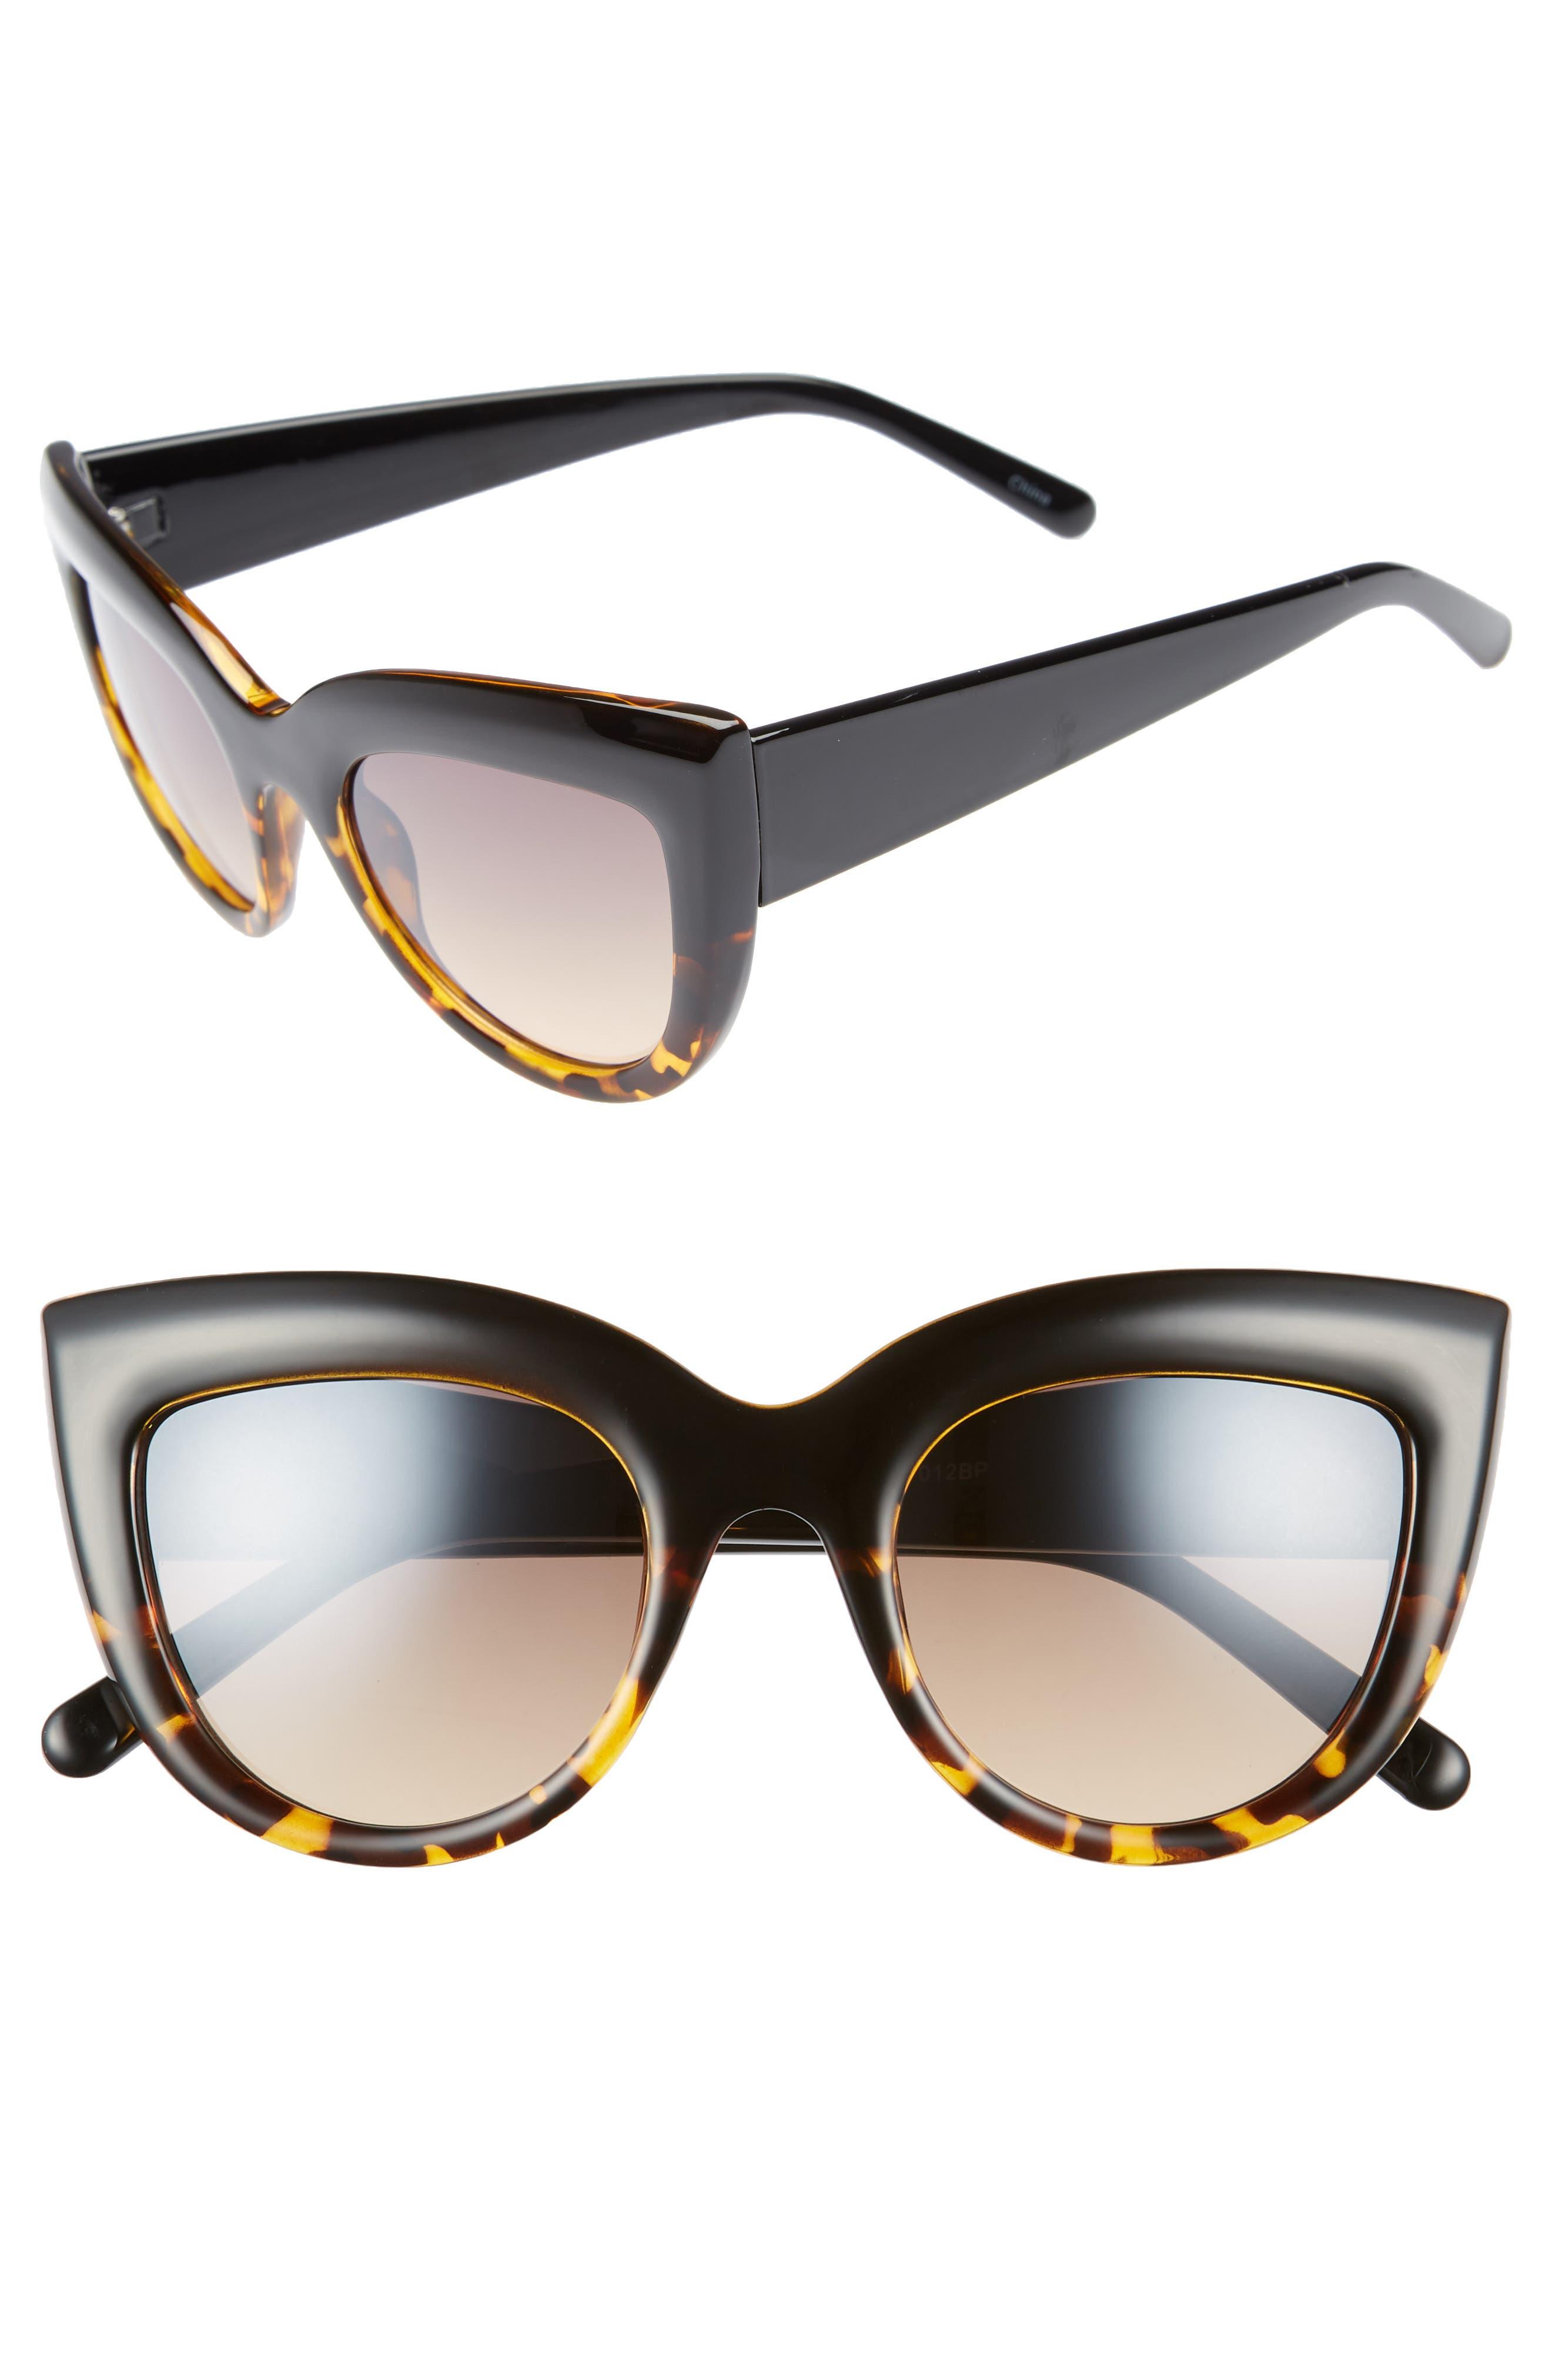 60mm Two-Tone Cat Eye Sunglasses,                         Main,                         color, Black/ Tort